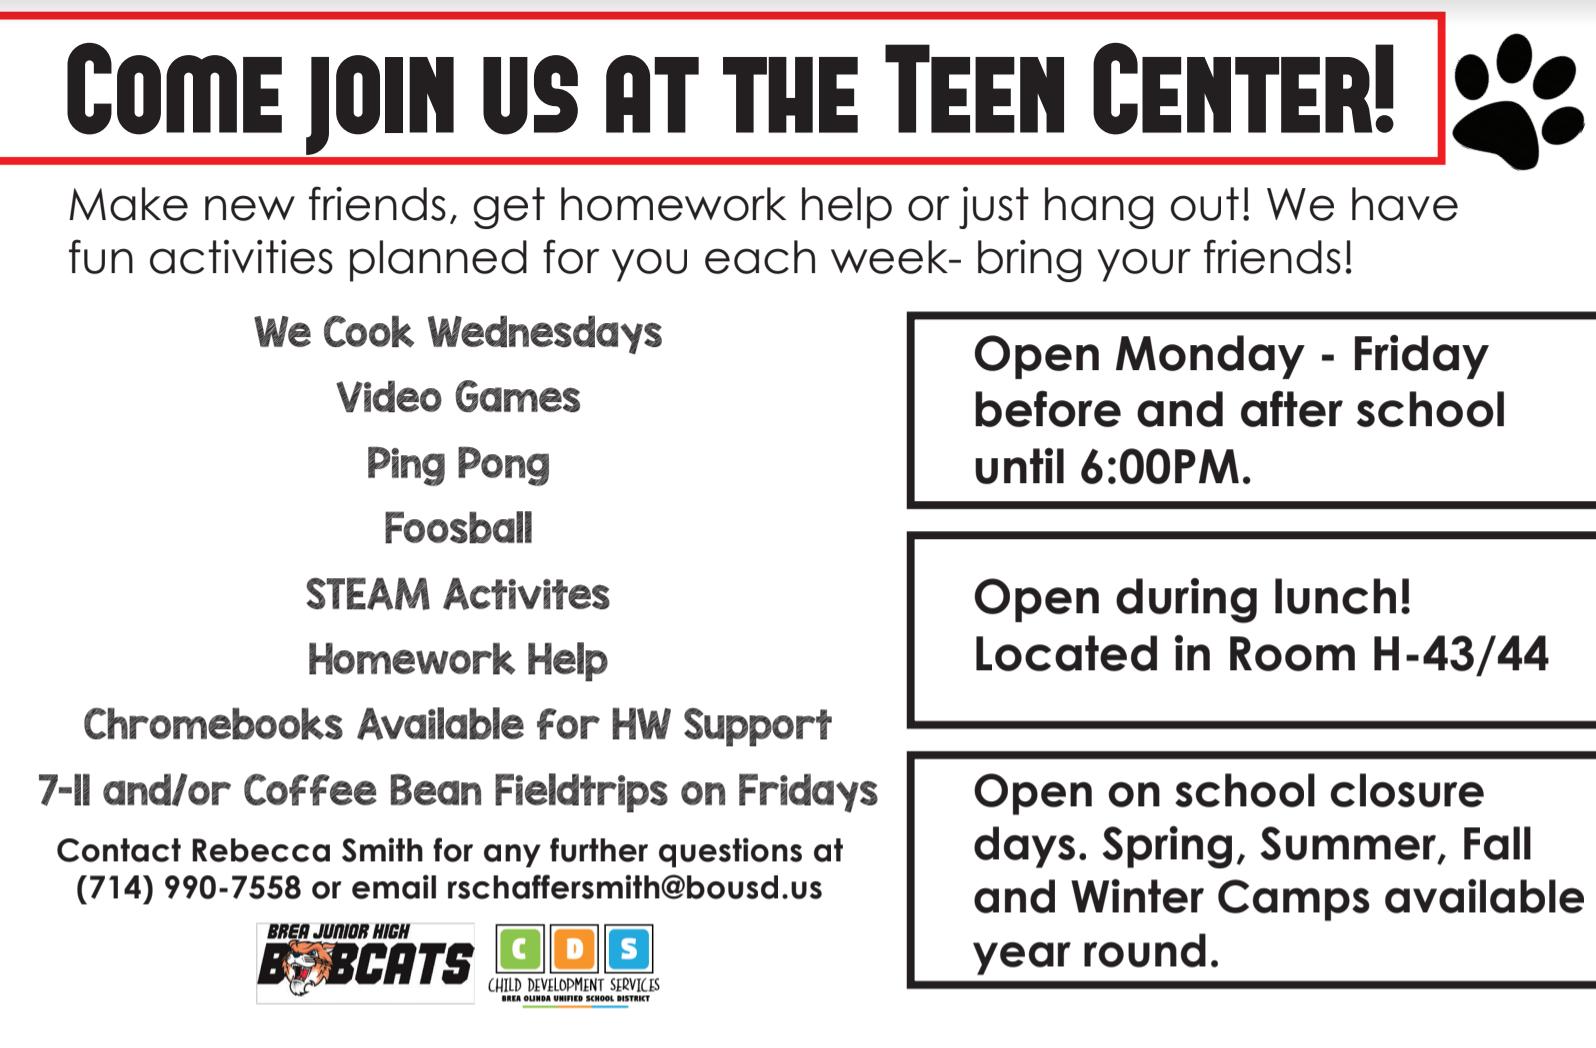 Teen Center Information